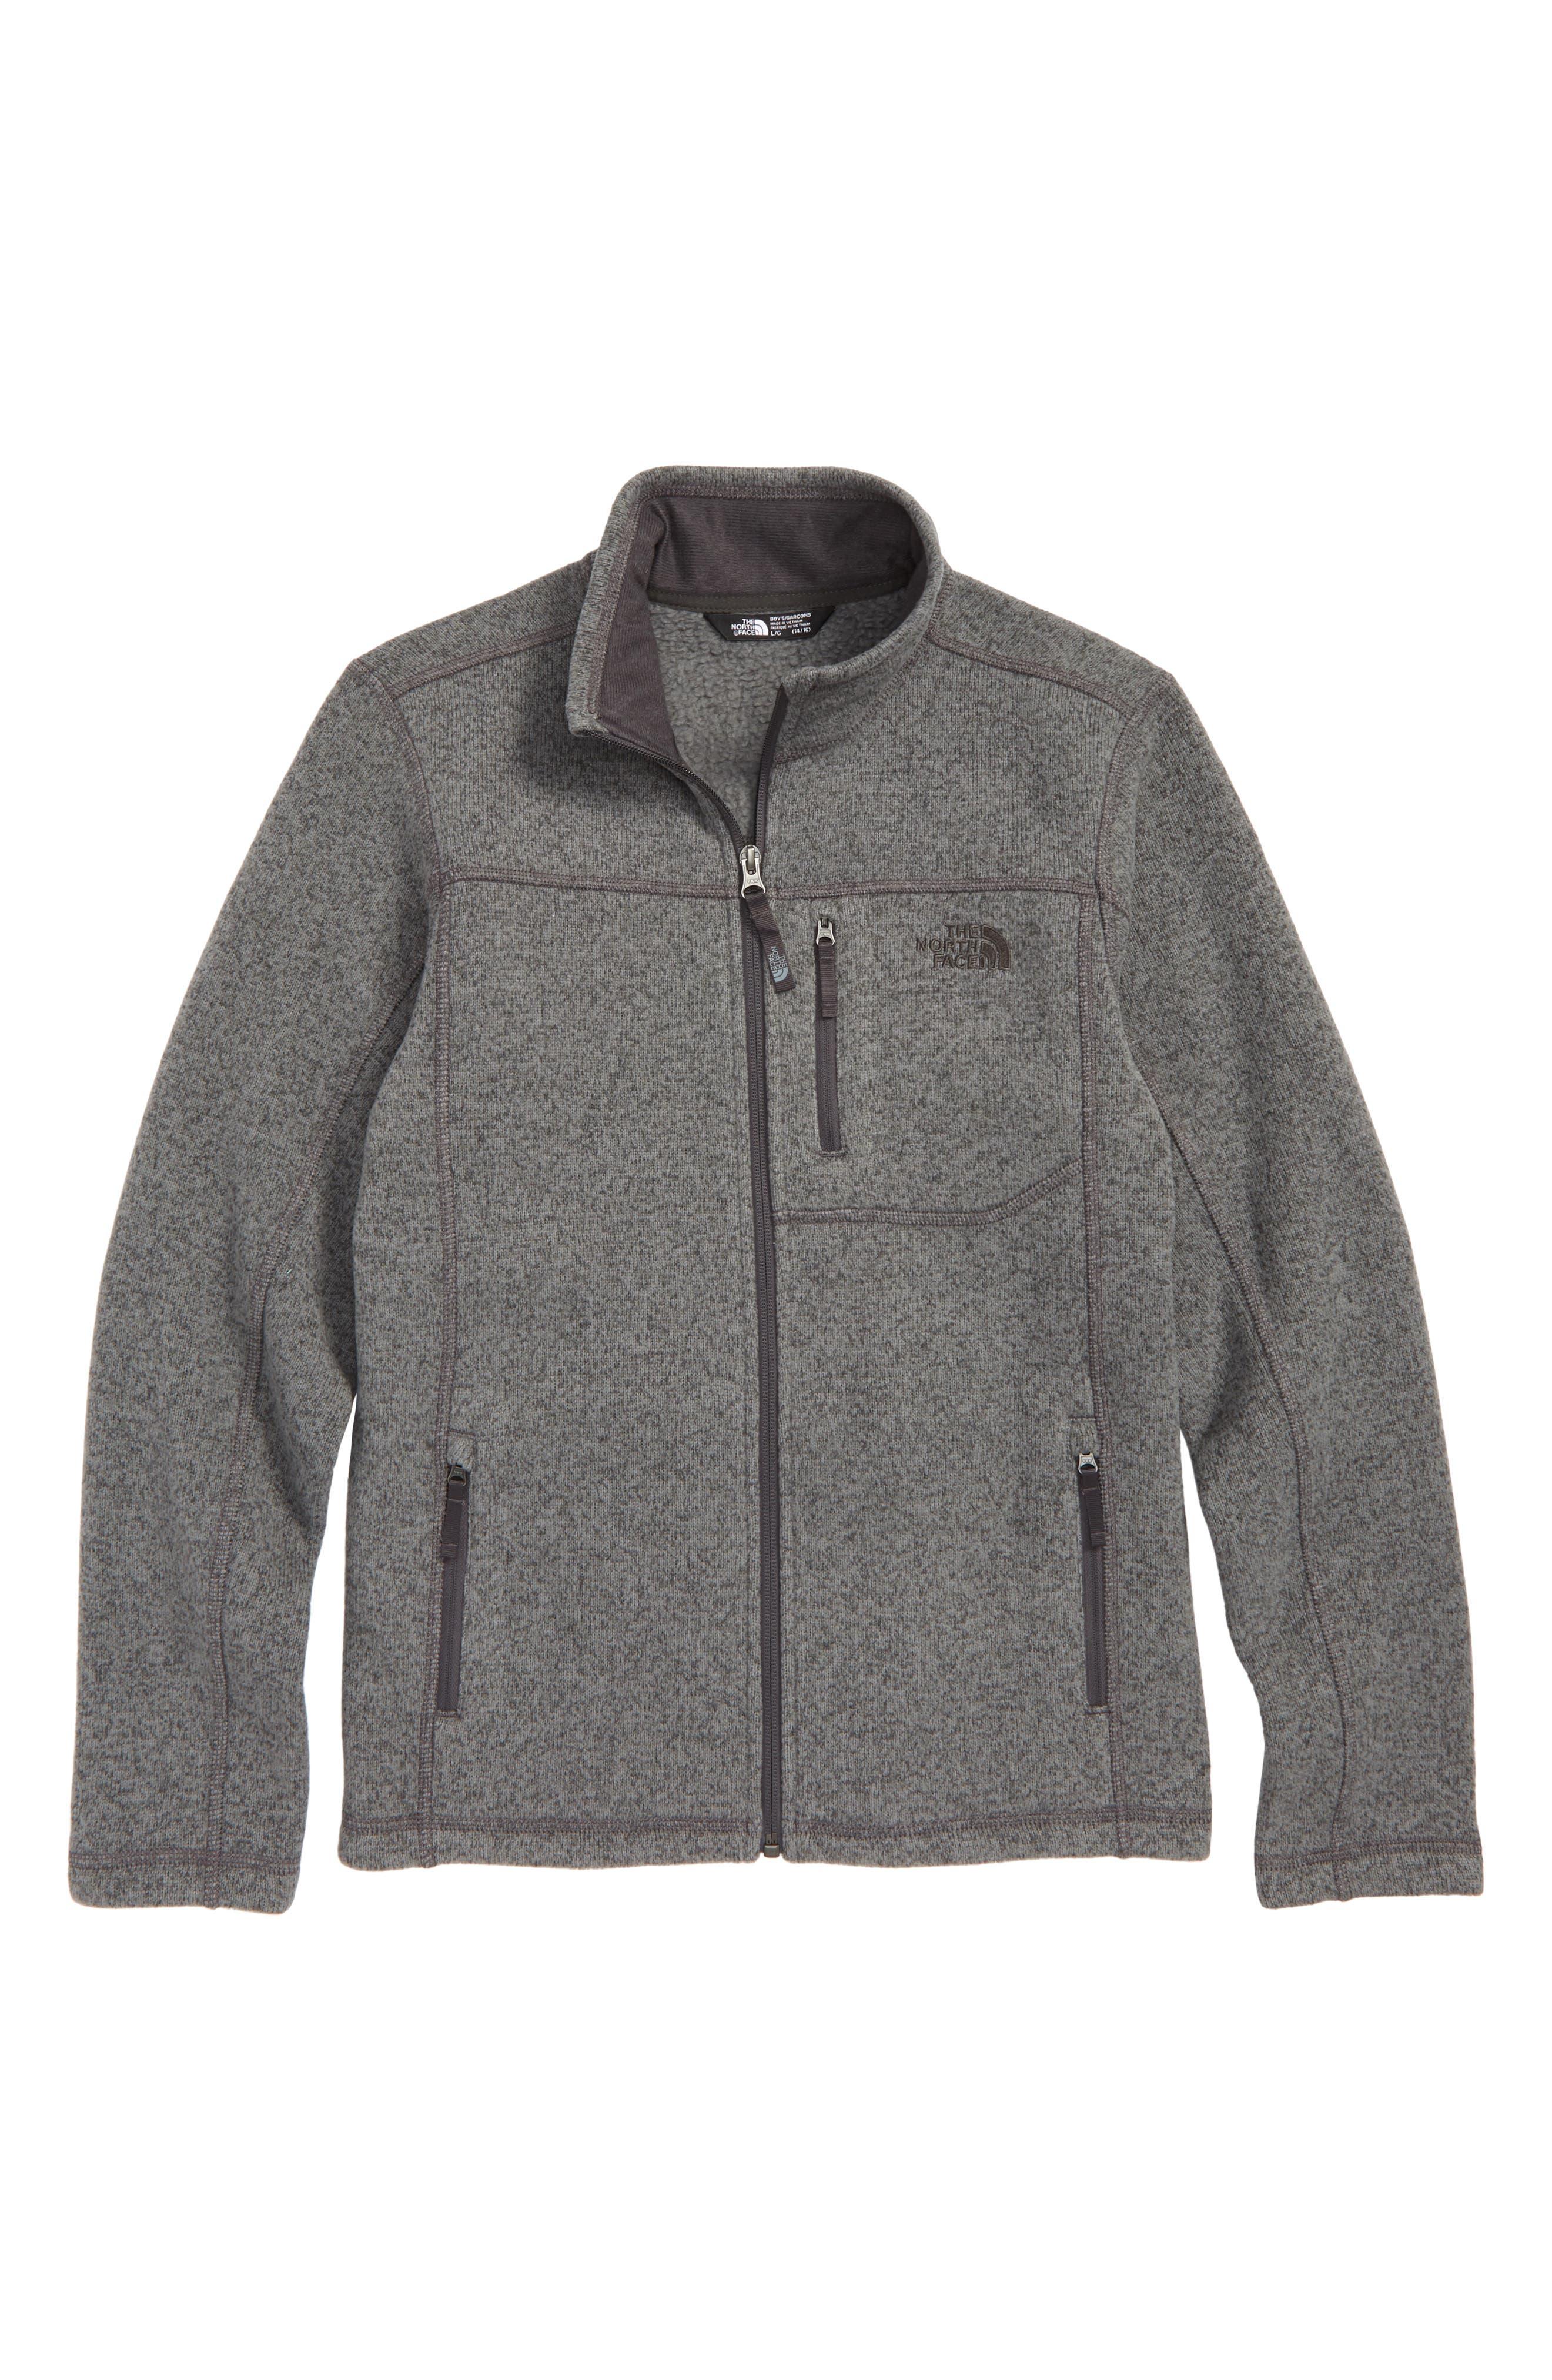 Gordon Lyons Sweater Fleece Zip Jacket,                             Main thumbnail 3, color,